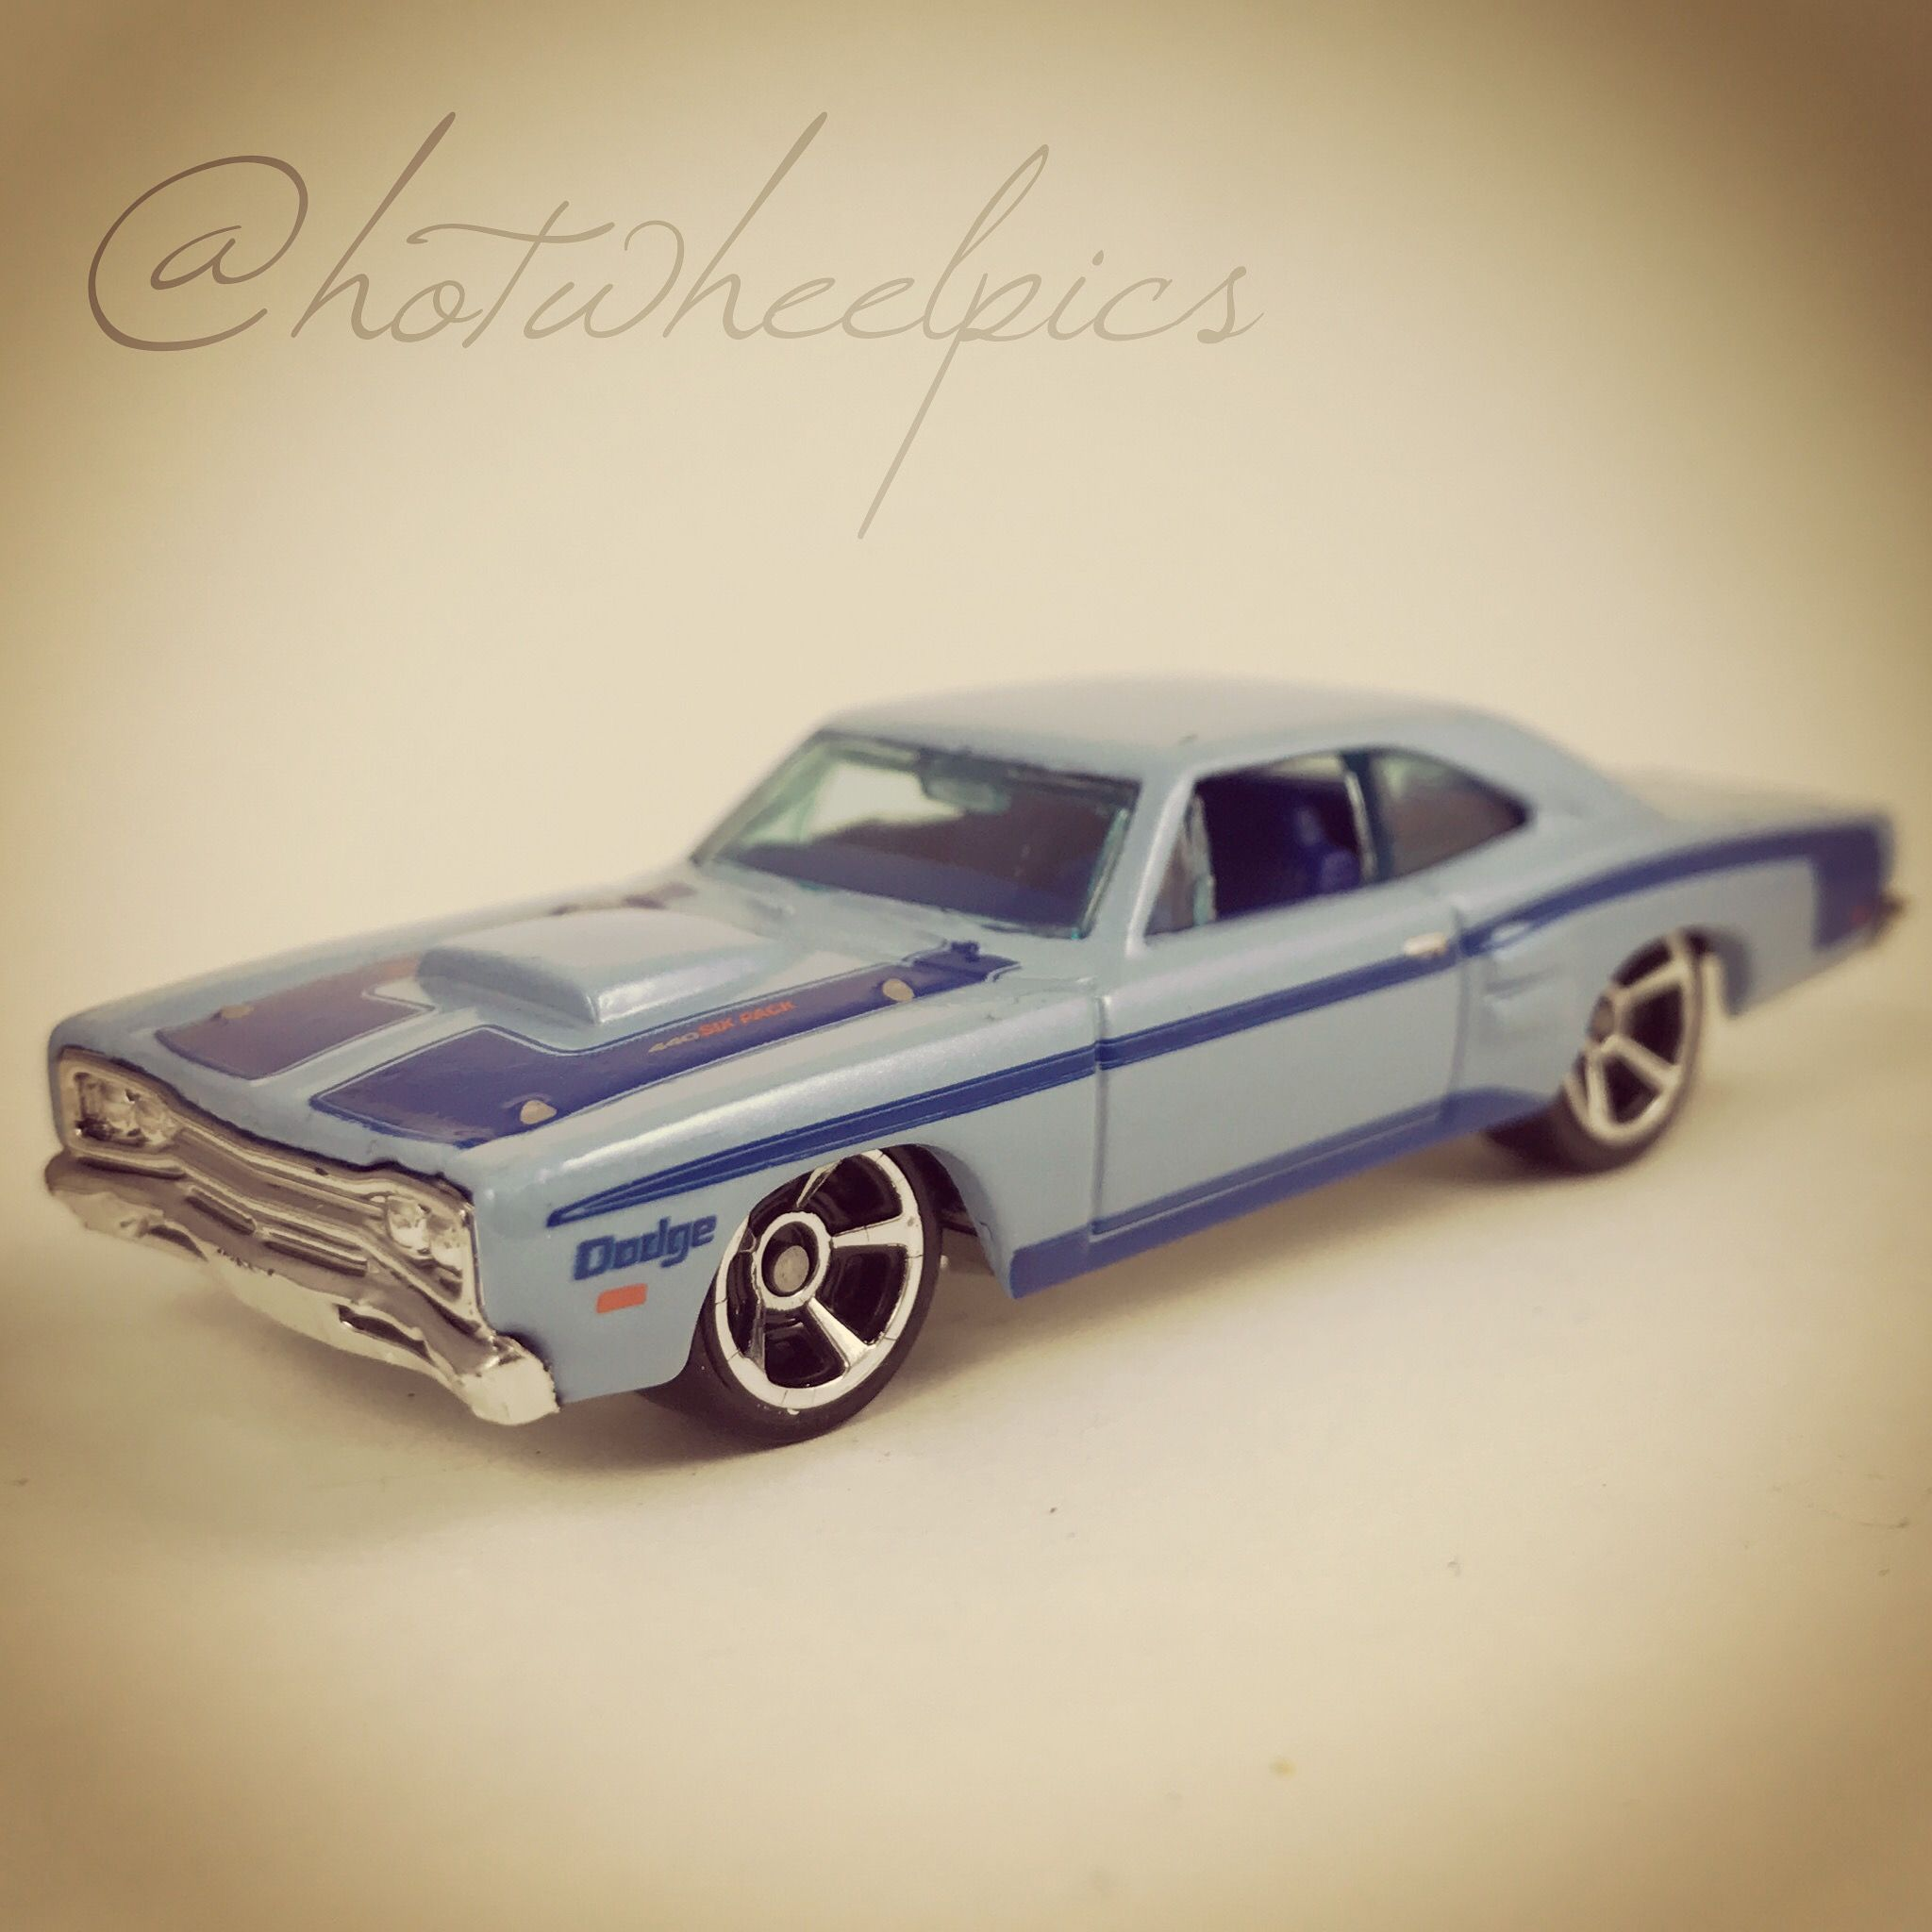 69 Dodge Coronet Super Bee - 2011 Hot Wheels - Toys R Us exclusive ...